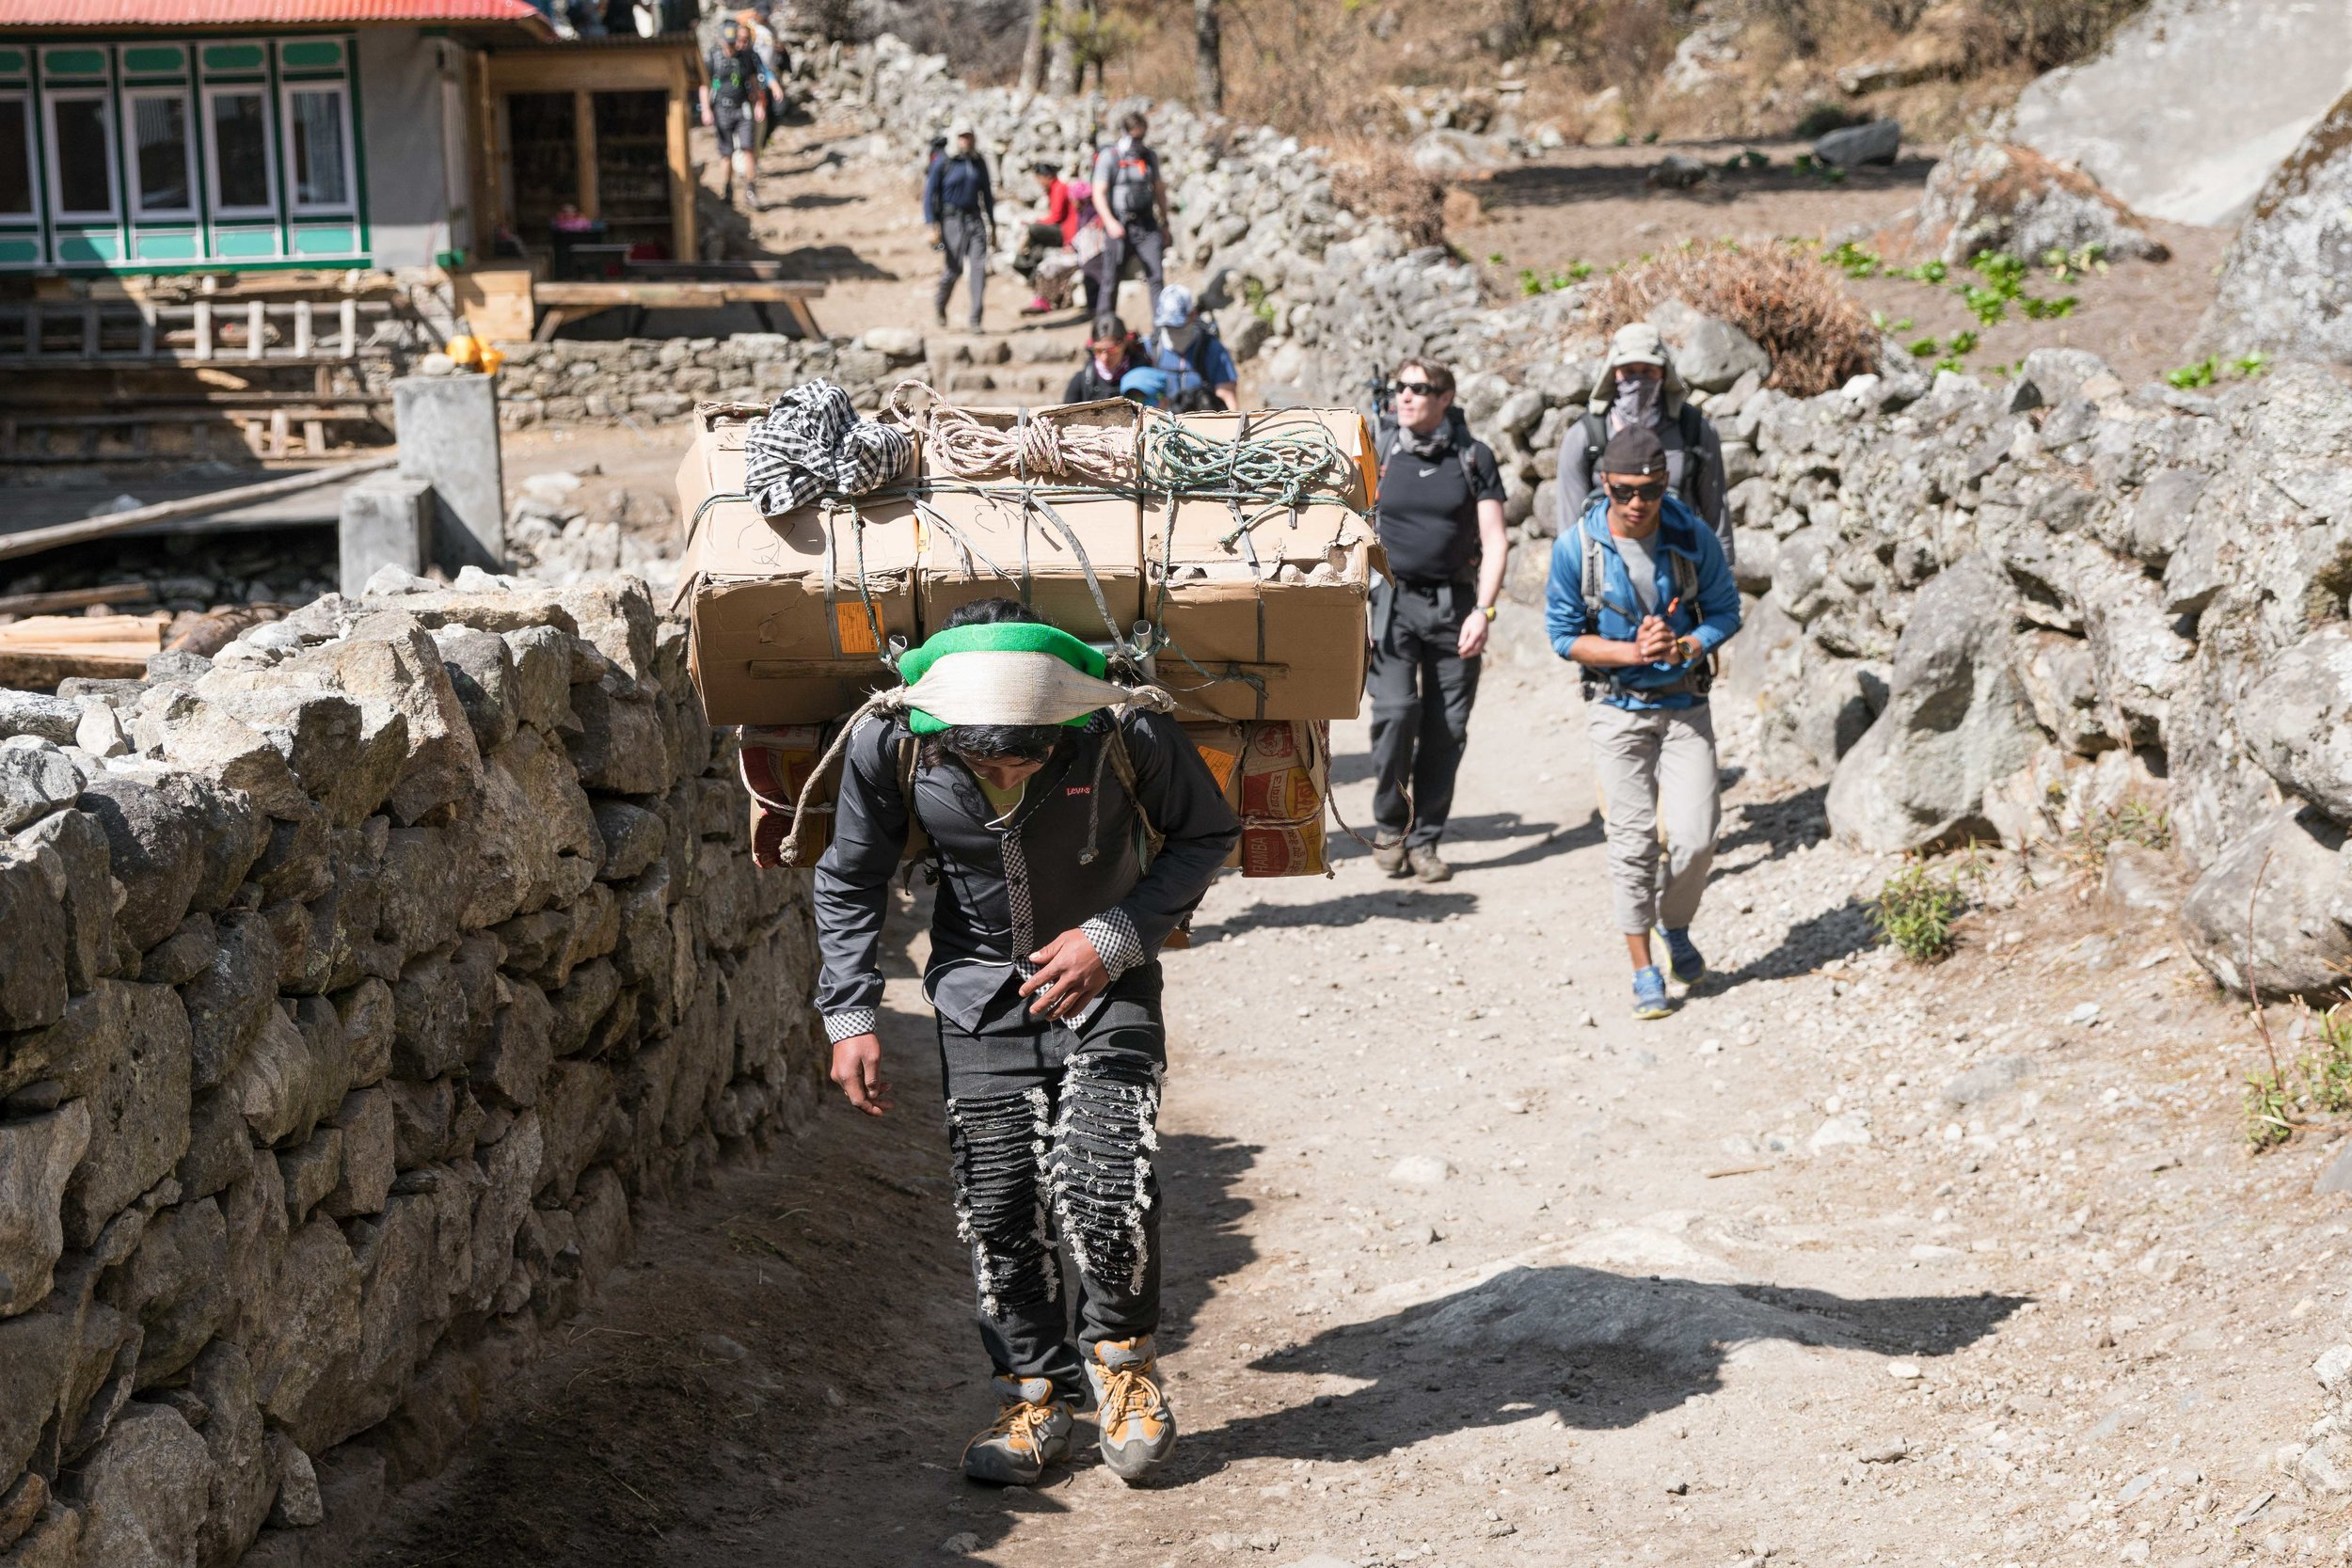 A porter carries goods along the trekking route between Lukla and Namche Bazar